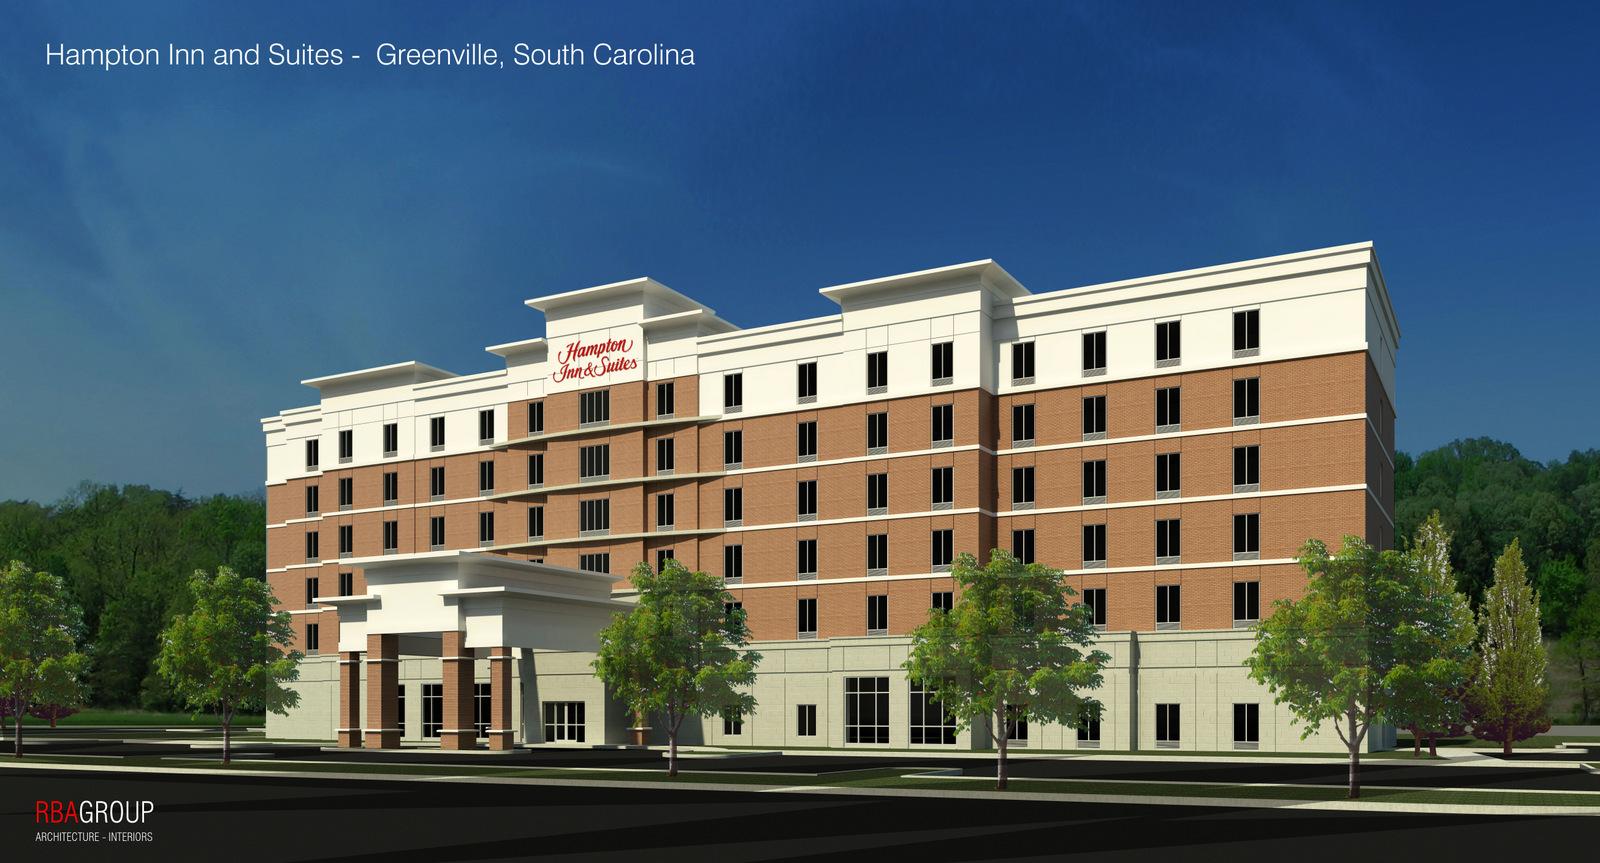 71 Pinnacle Interior Design Greenville Sc Hampton Inn Suites Greenville Airport Sc Jobs